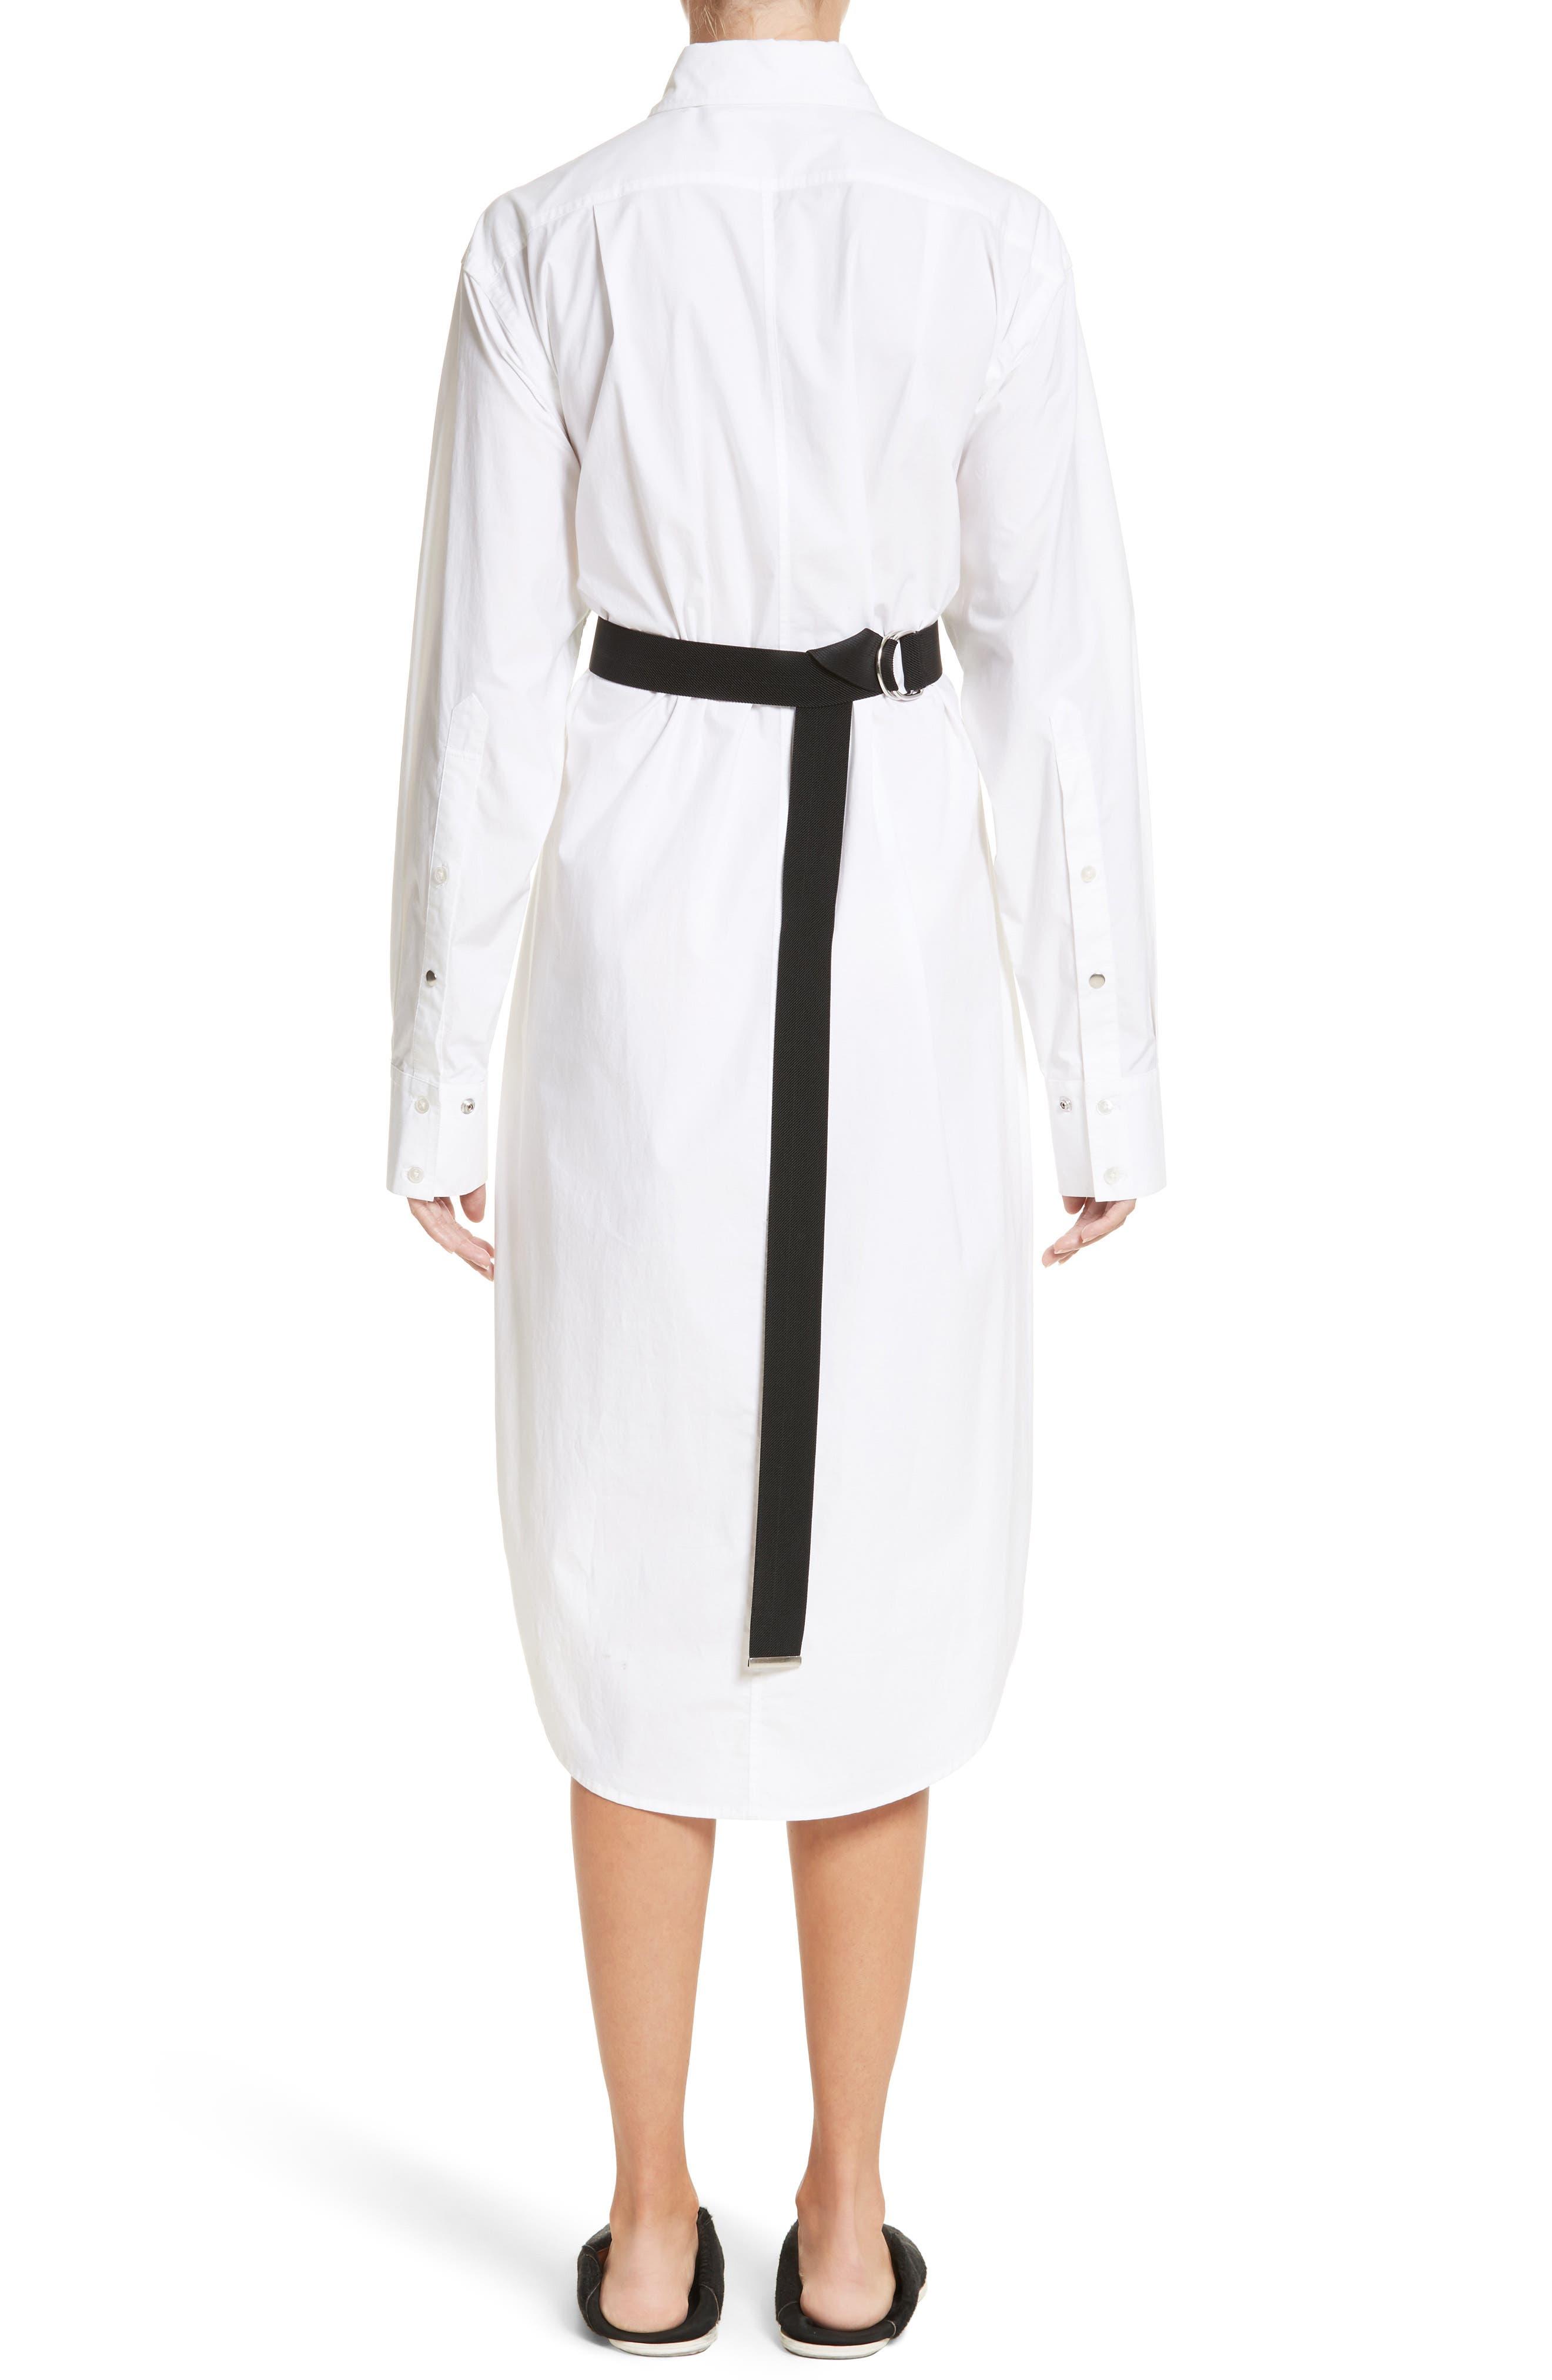 PSWL Belted Poplin Shirtdress,                             Alternate thumbnail 2, color,                             Optic White/ Black